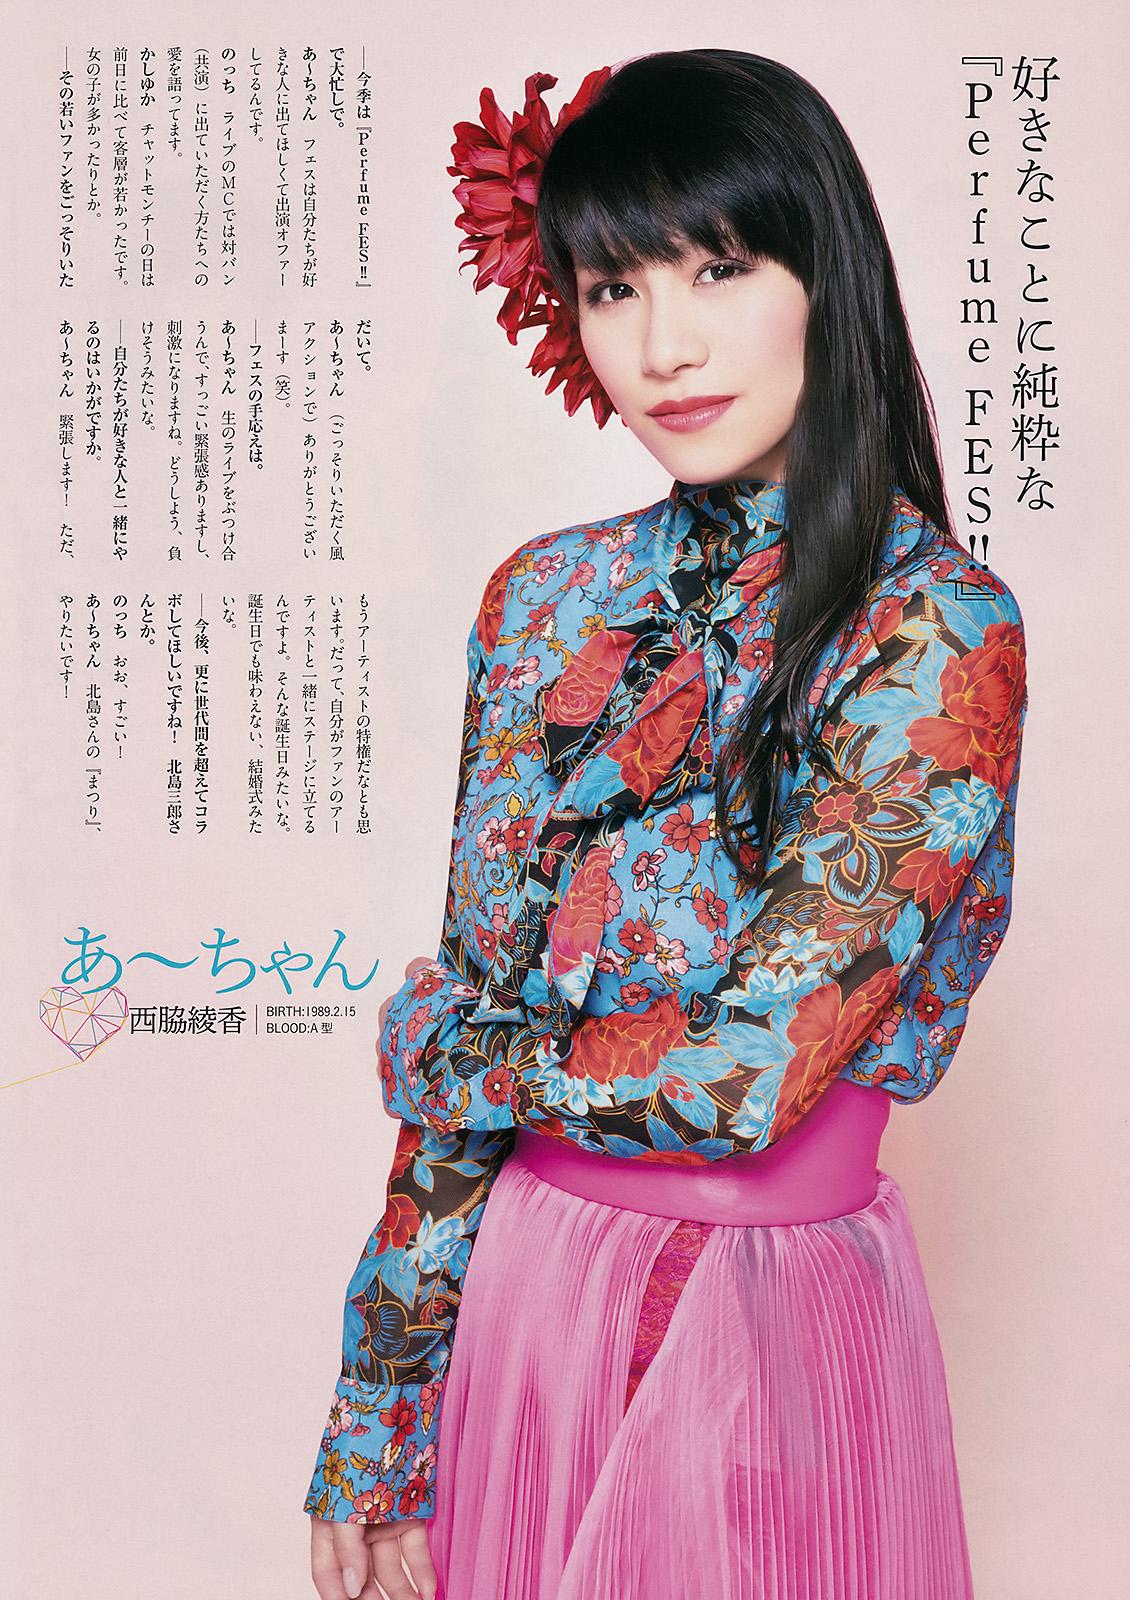 Perfume, Big Comic Spirits 2017 No.40 (週刊スピリッツ 2017年40号)